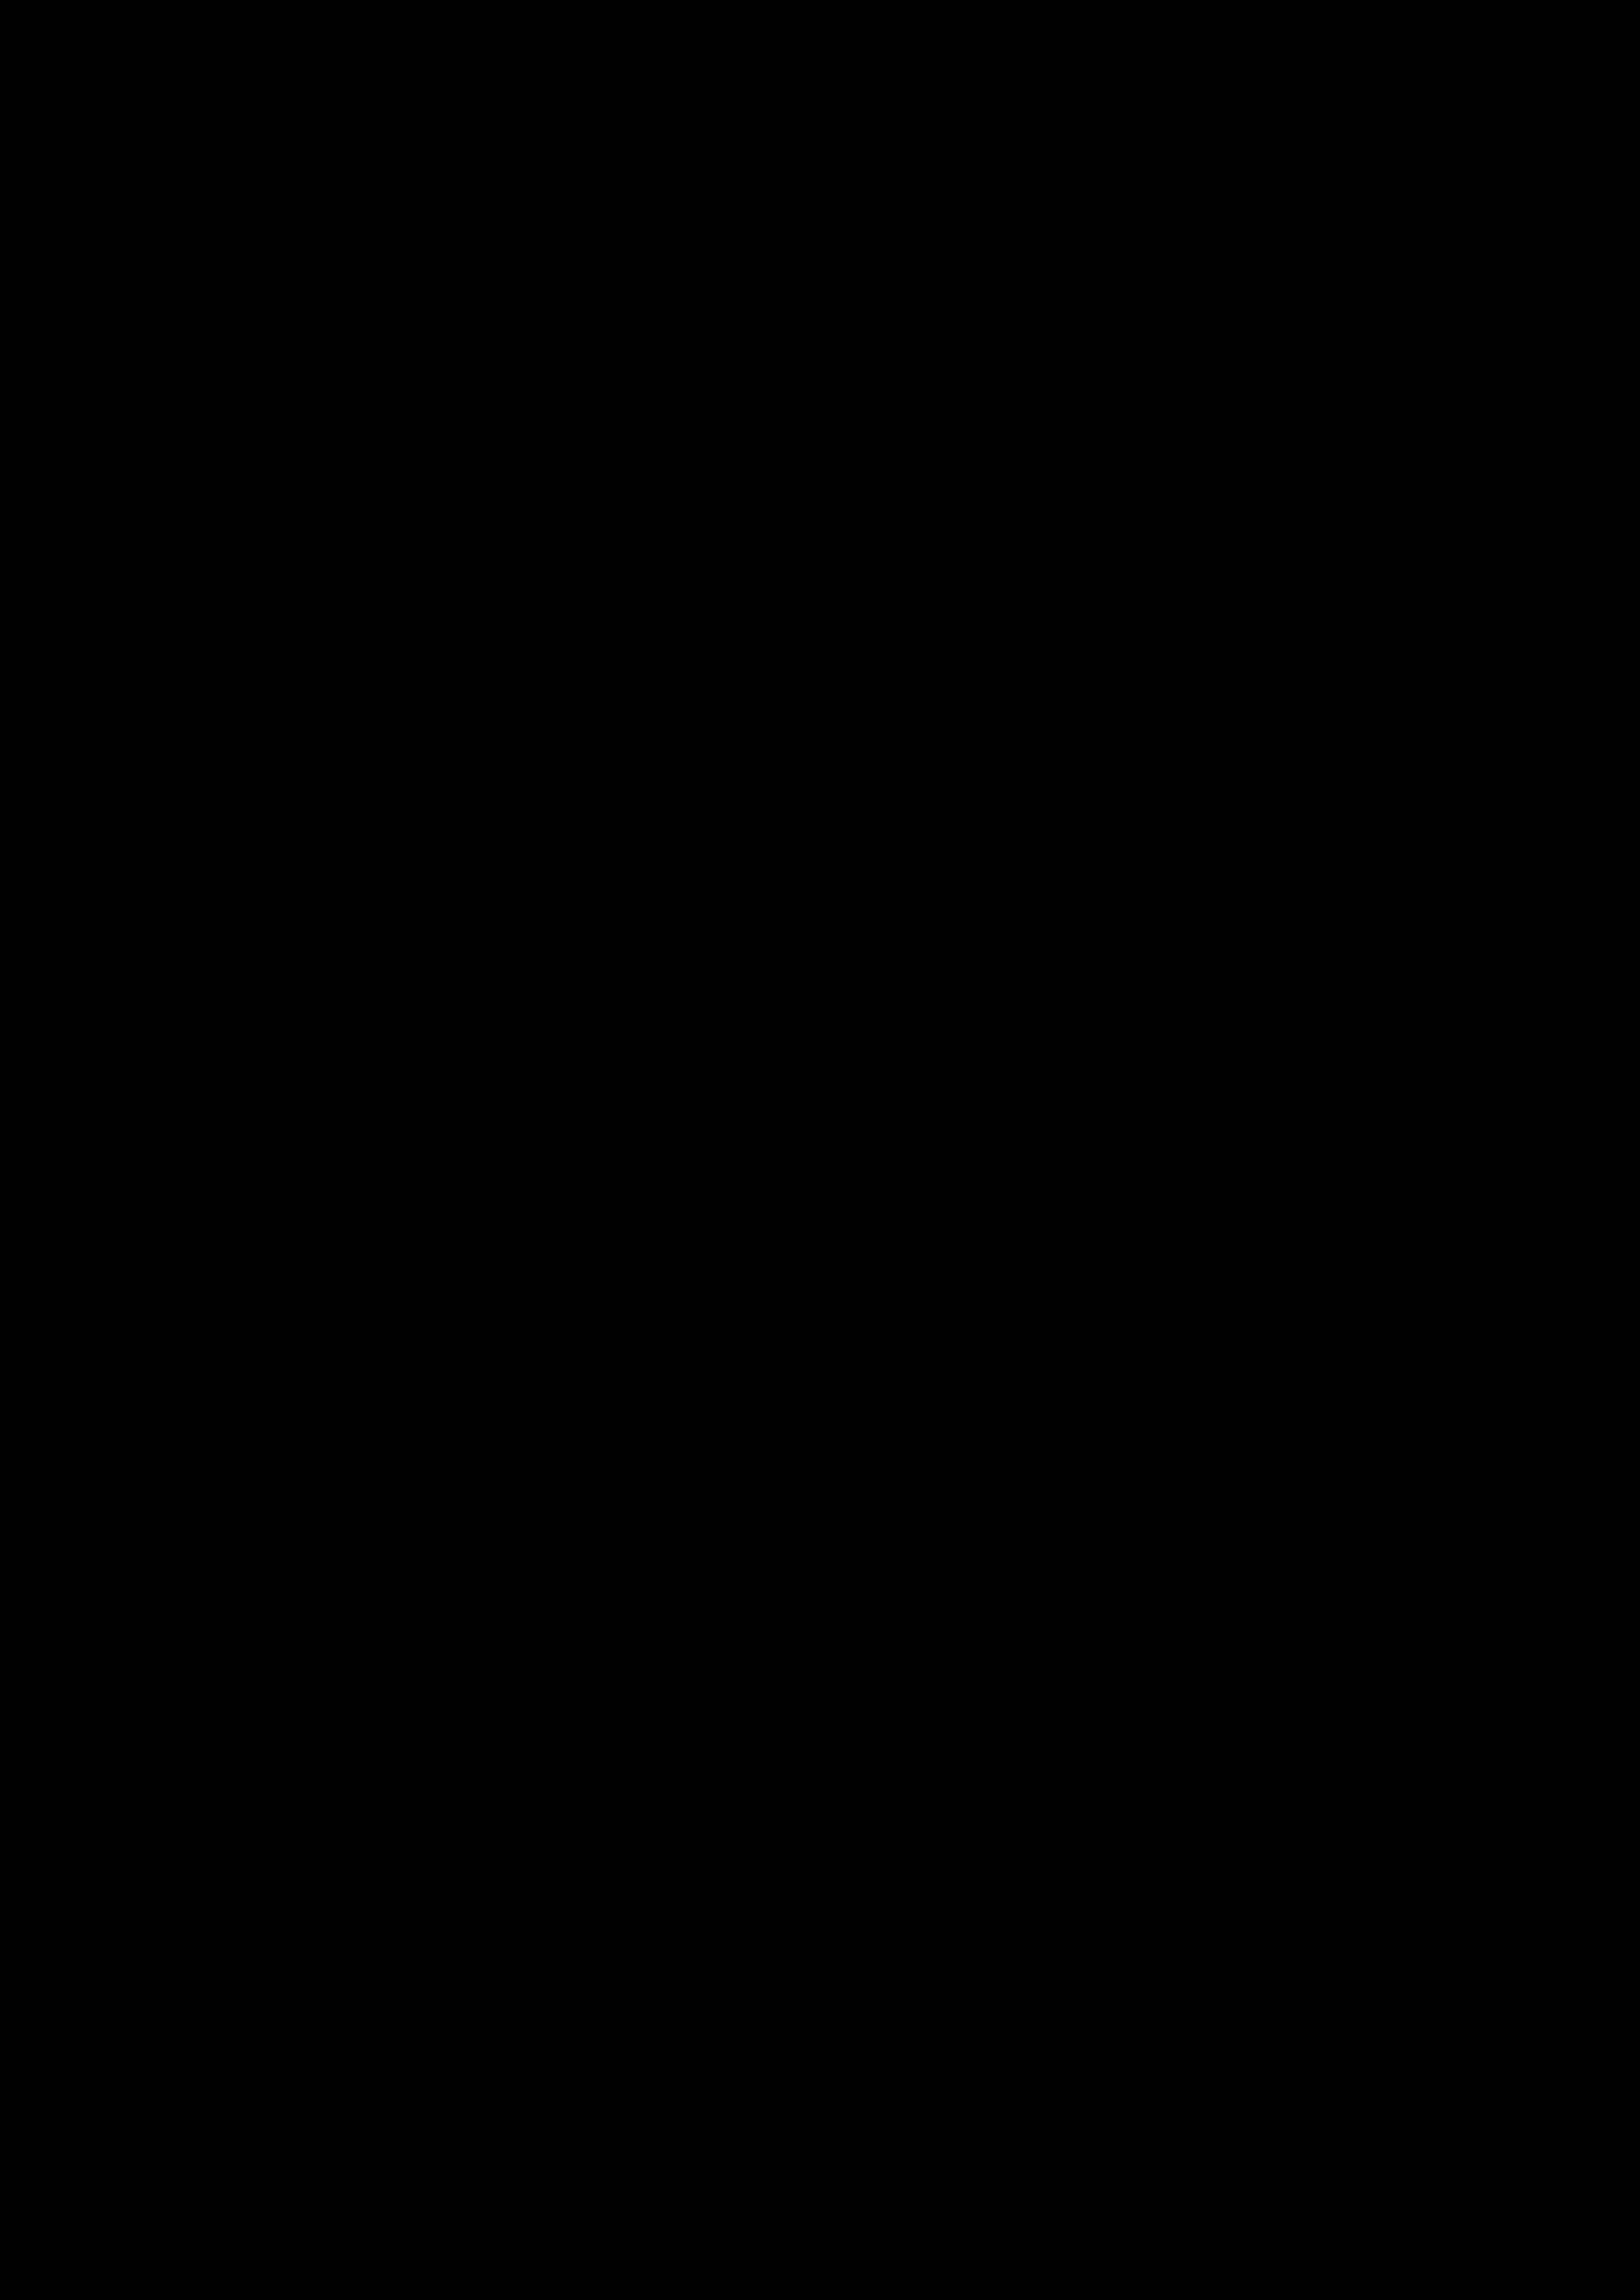 Simple wind big image. Clipart rose basic